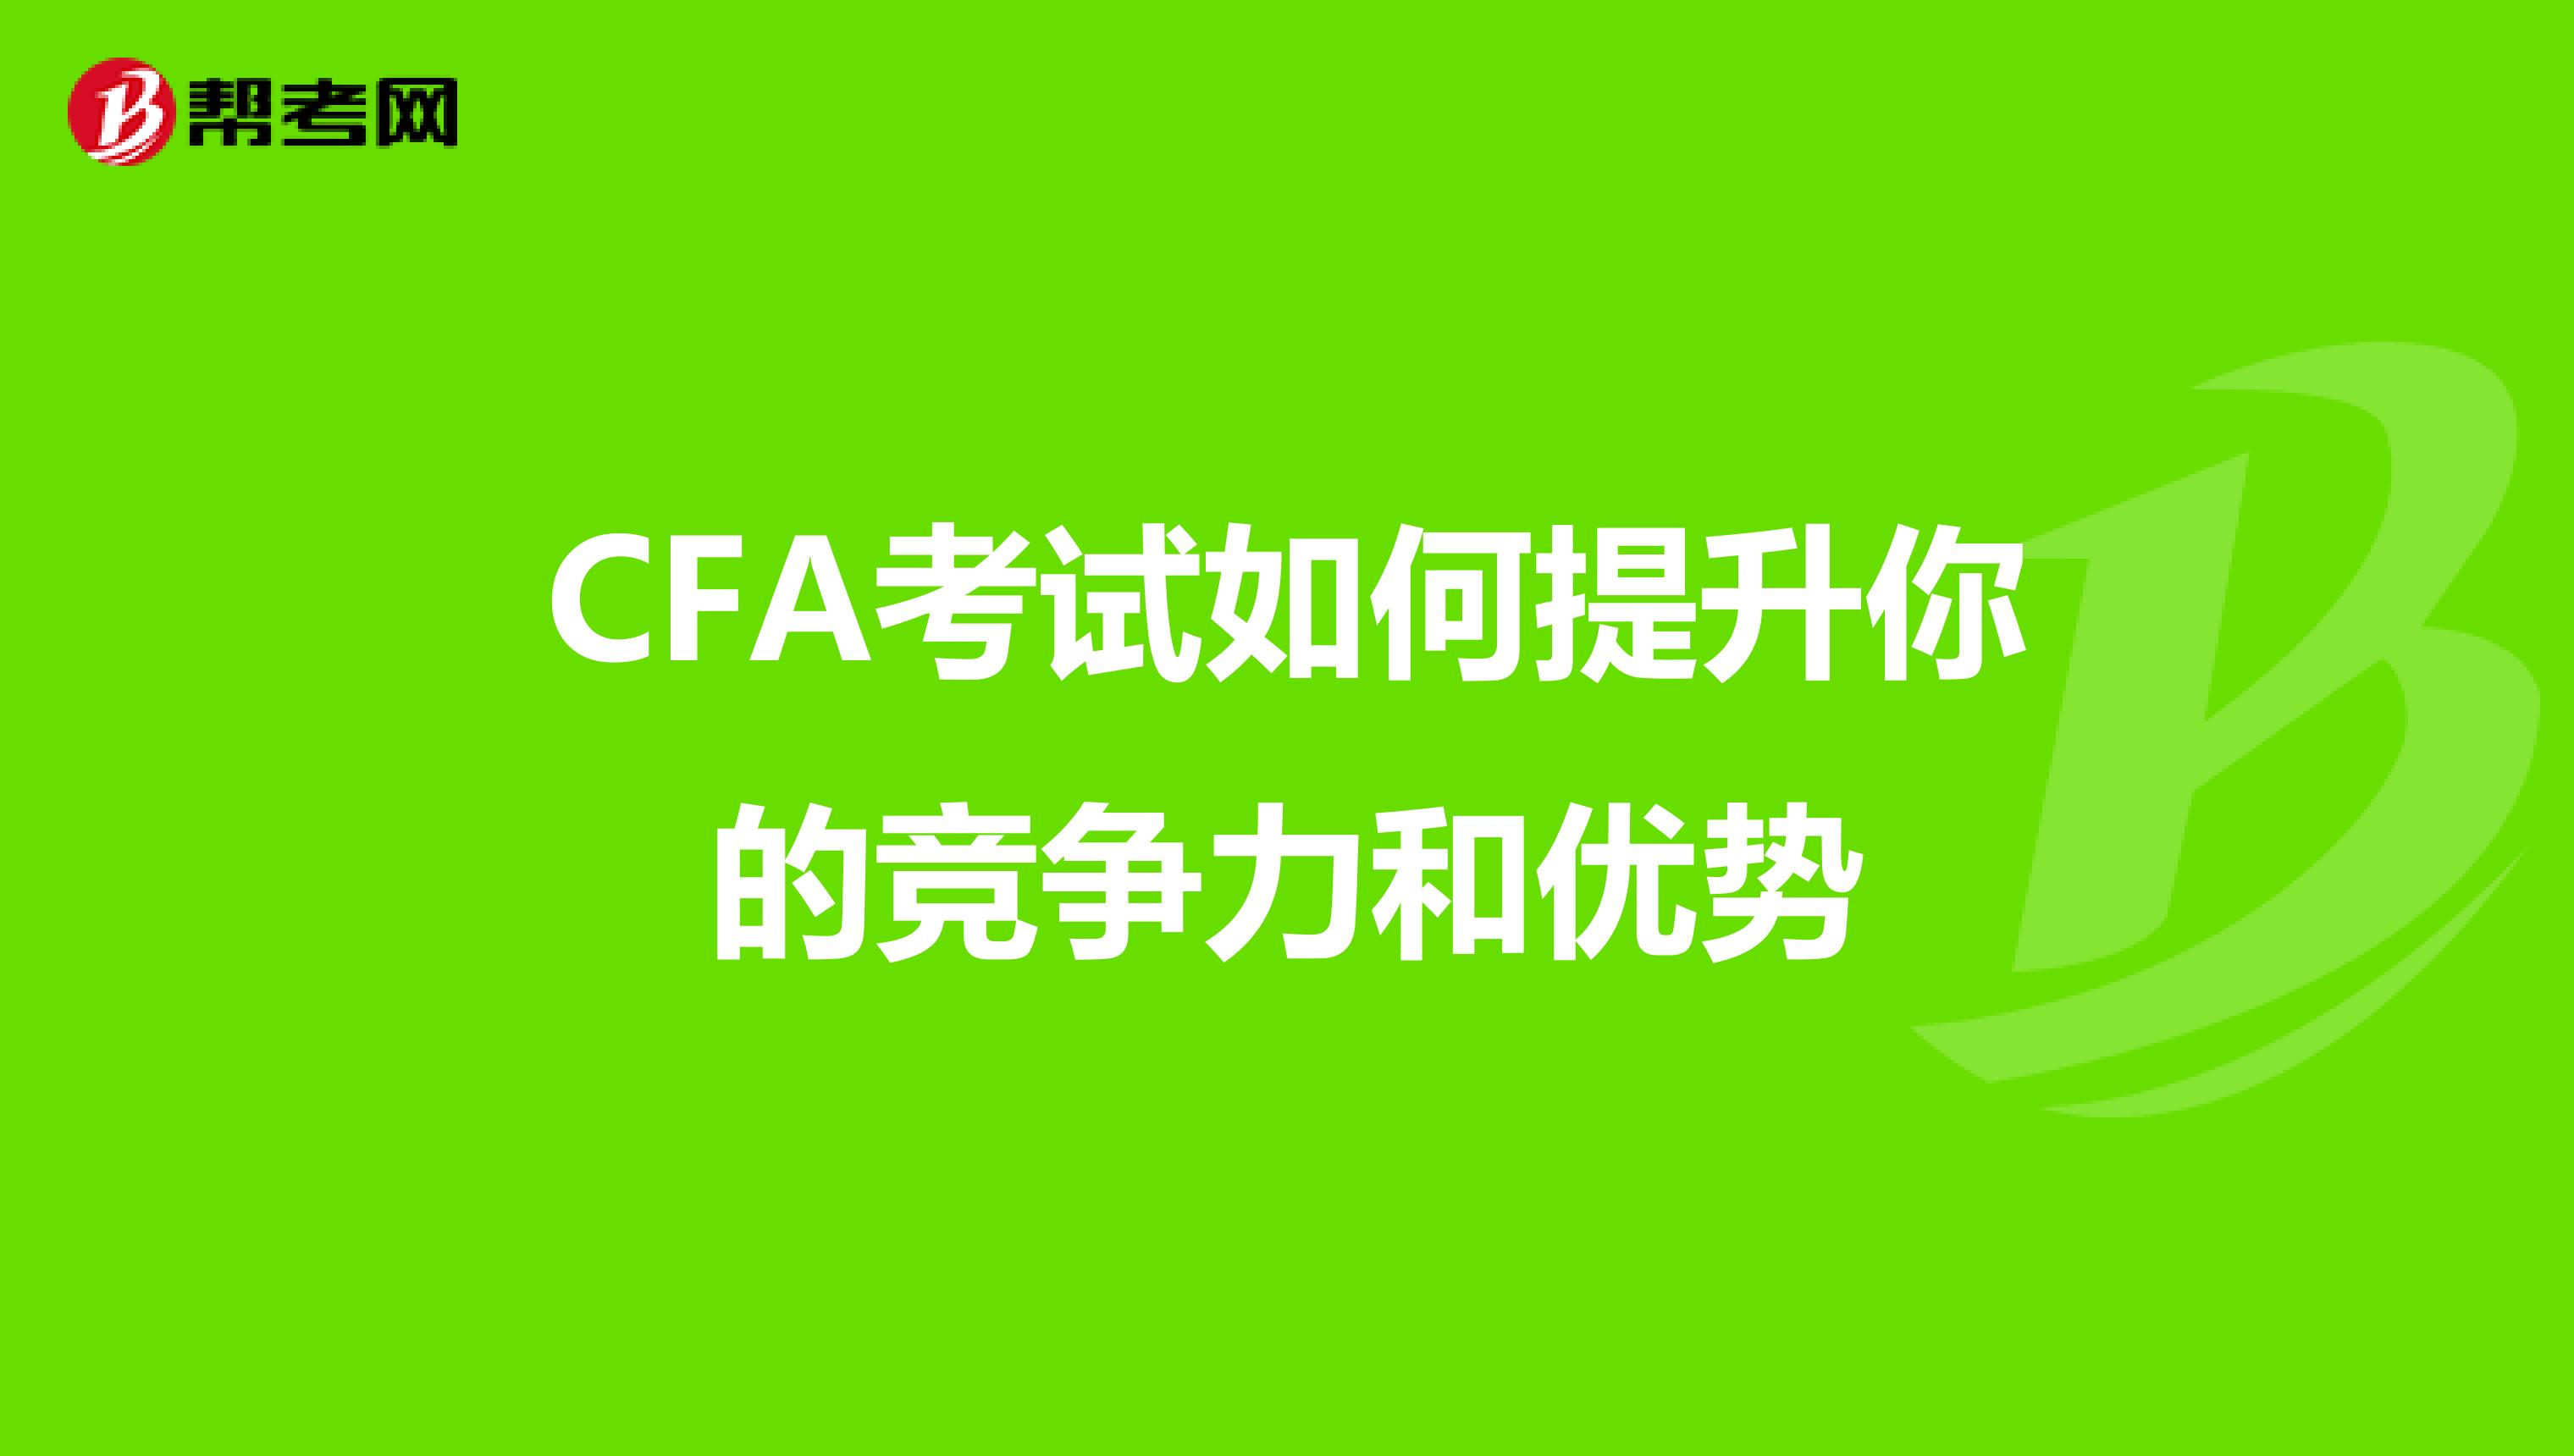 CFA考试如何提升你的竞争力和优势